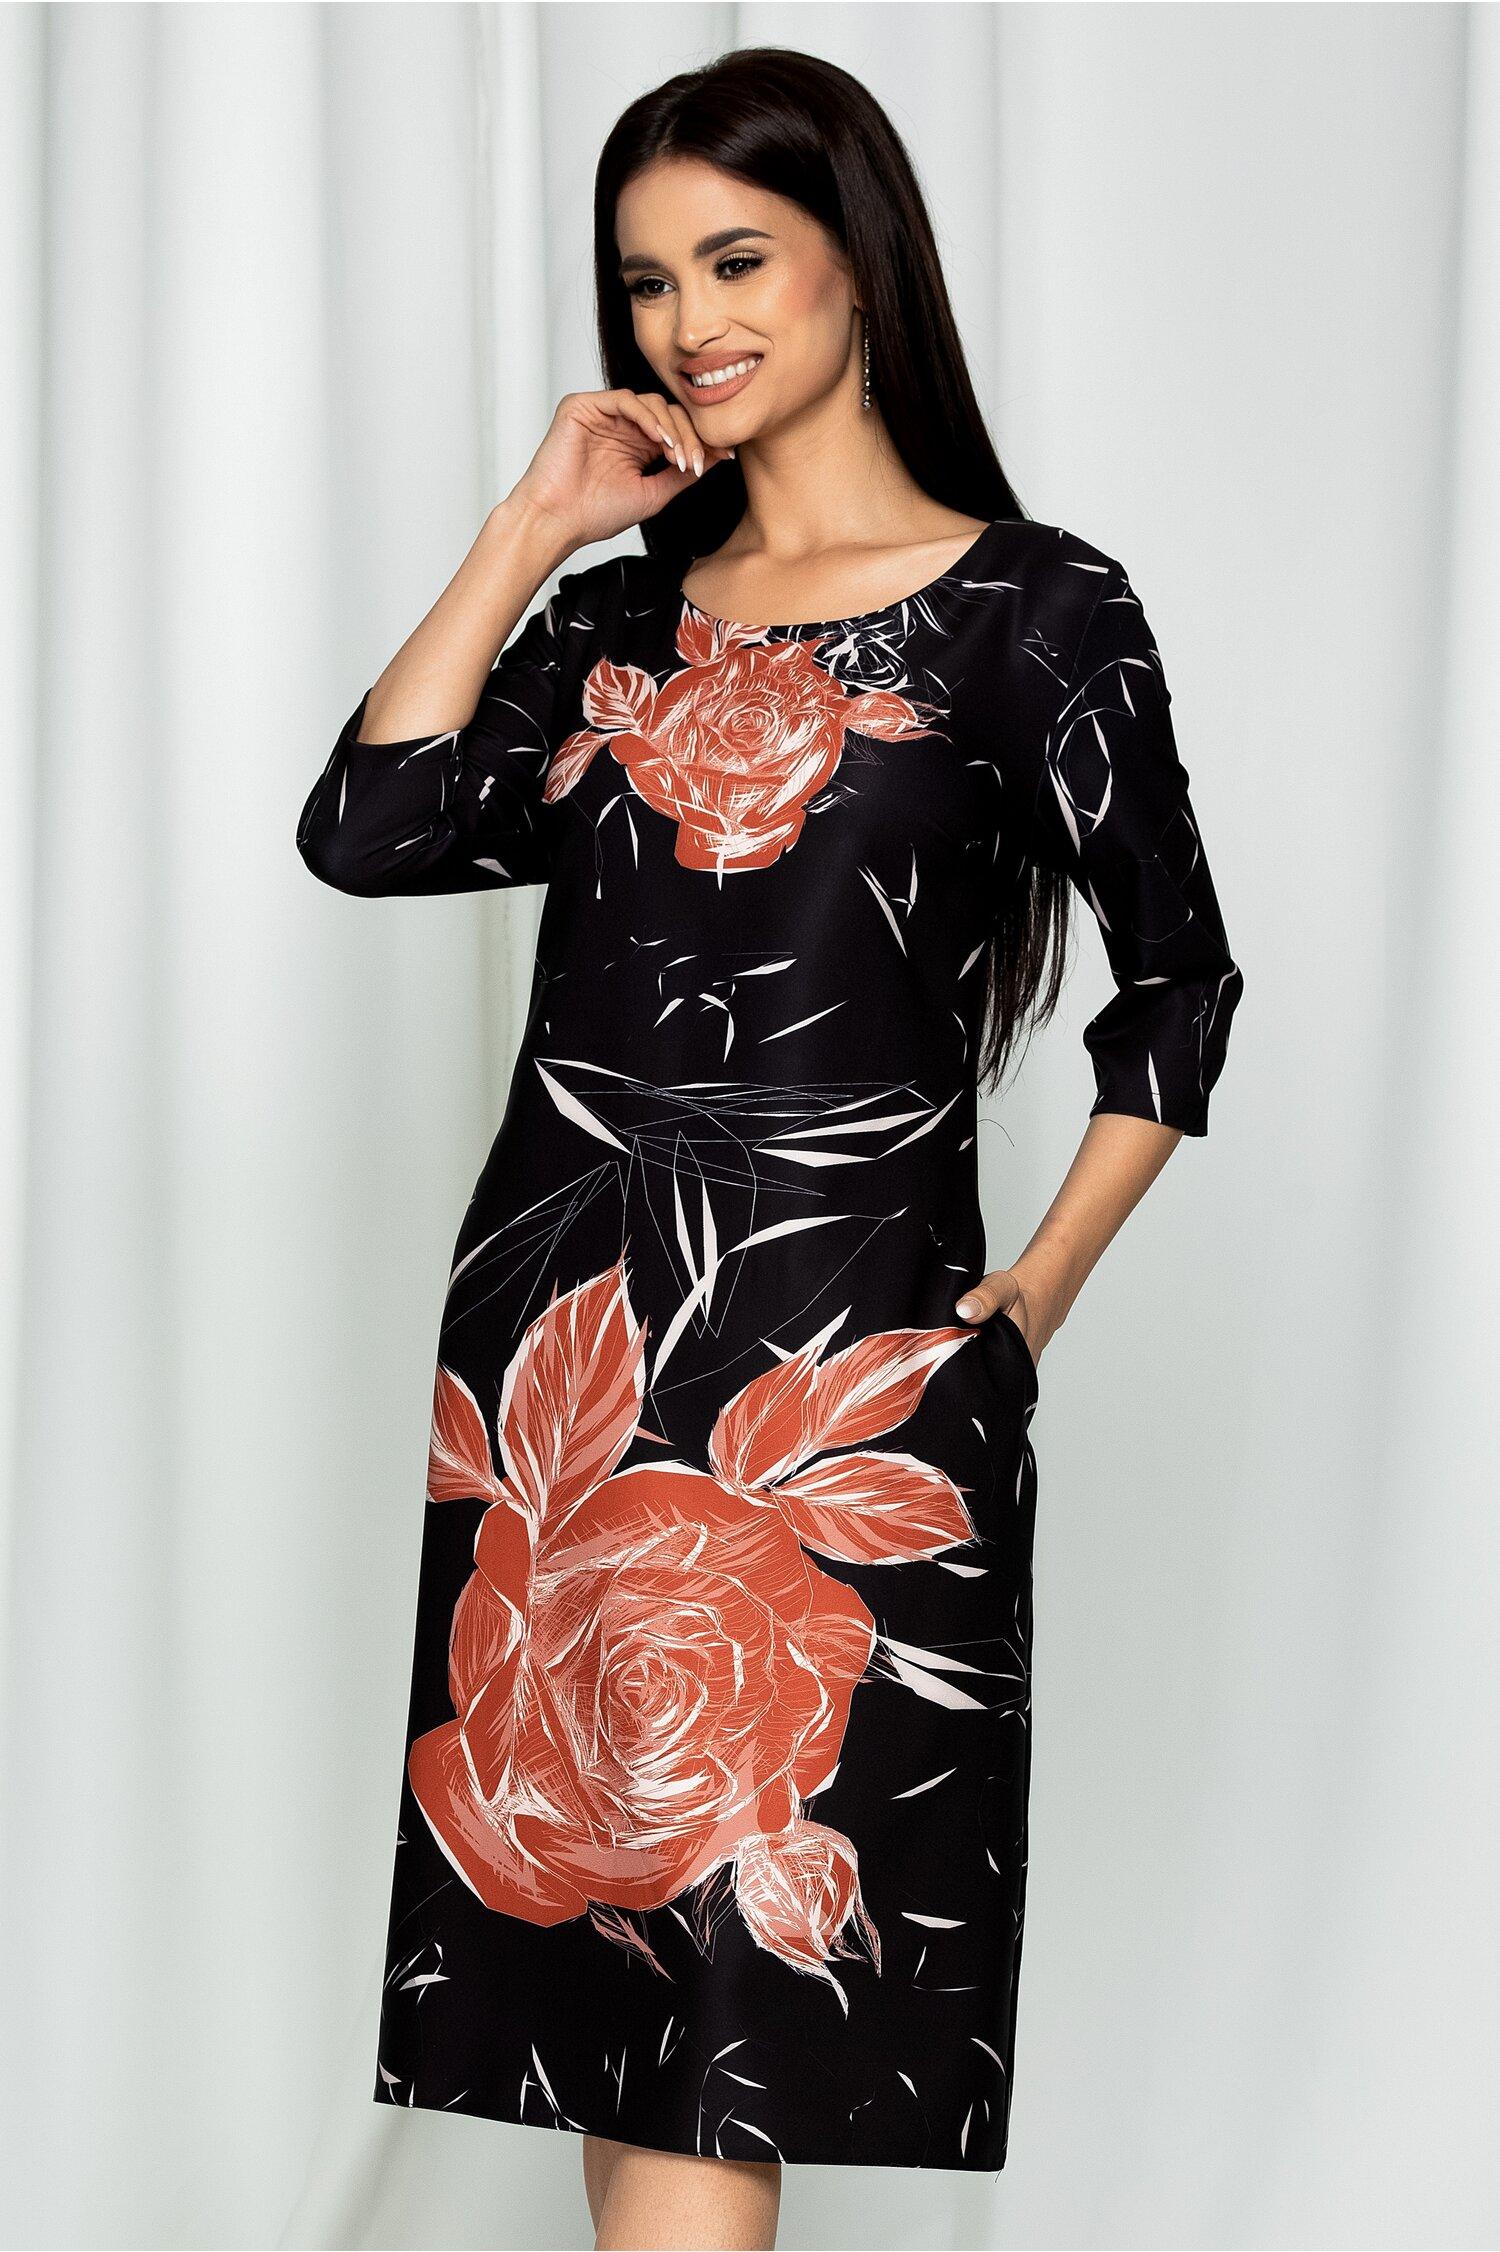 Rochie Ester neagra cu imprimeu floral maro